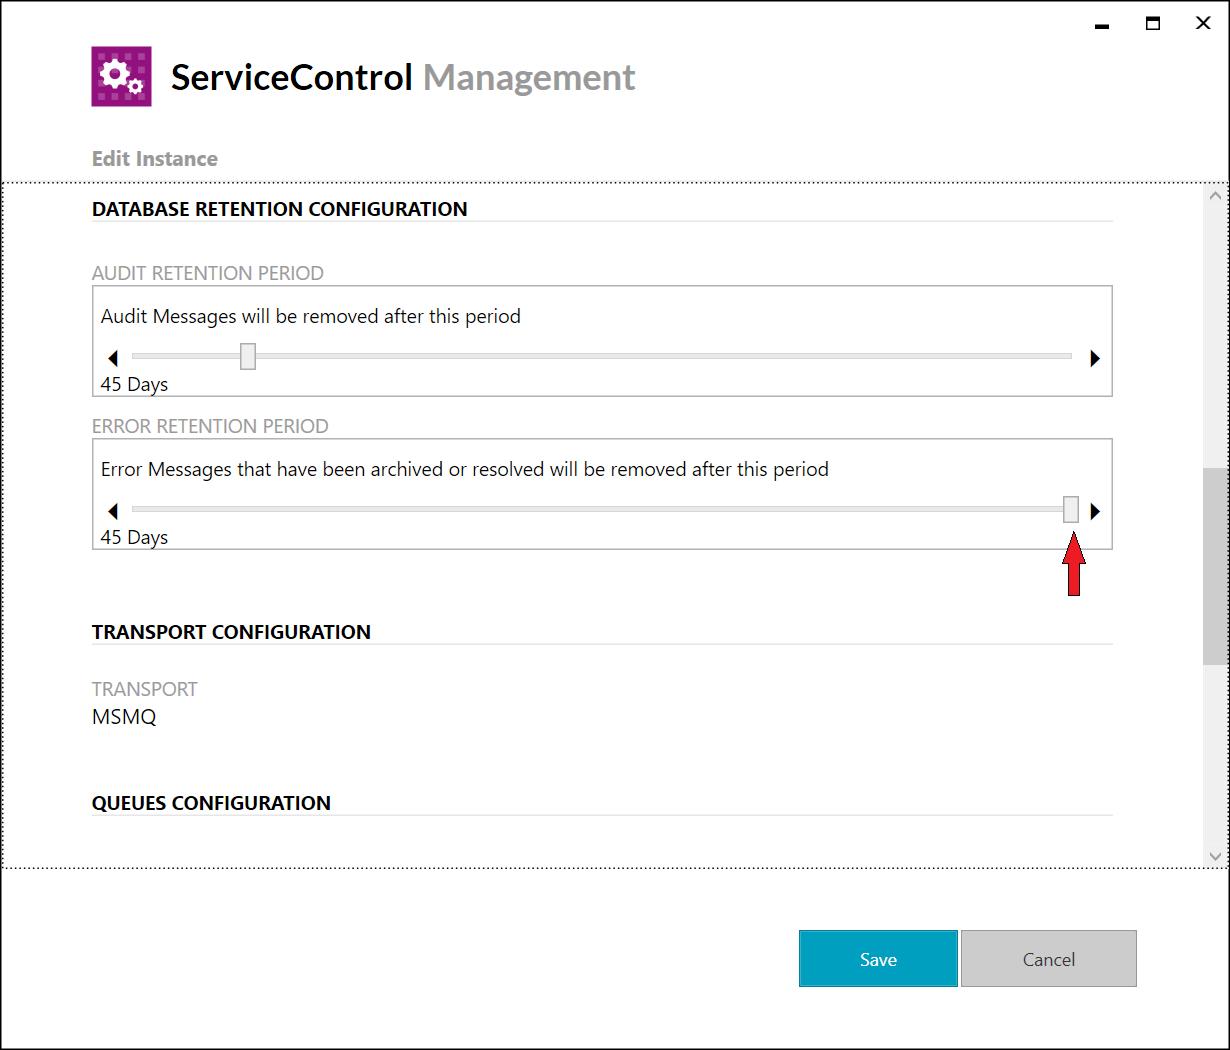 ServiceControl Management Utility - Max Error Retention